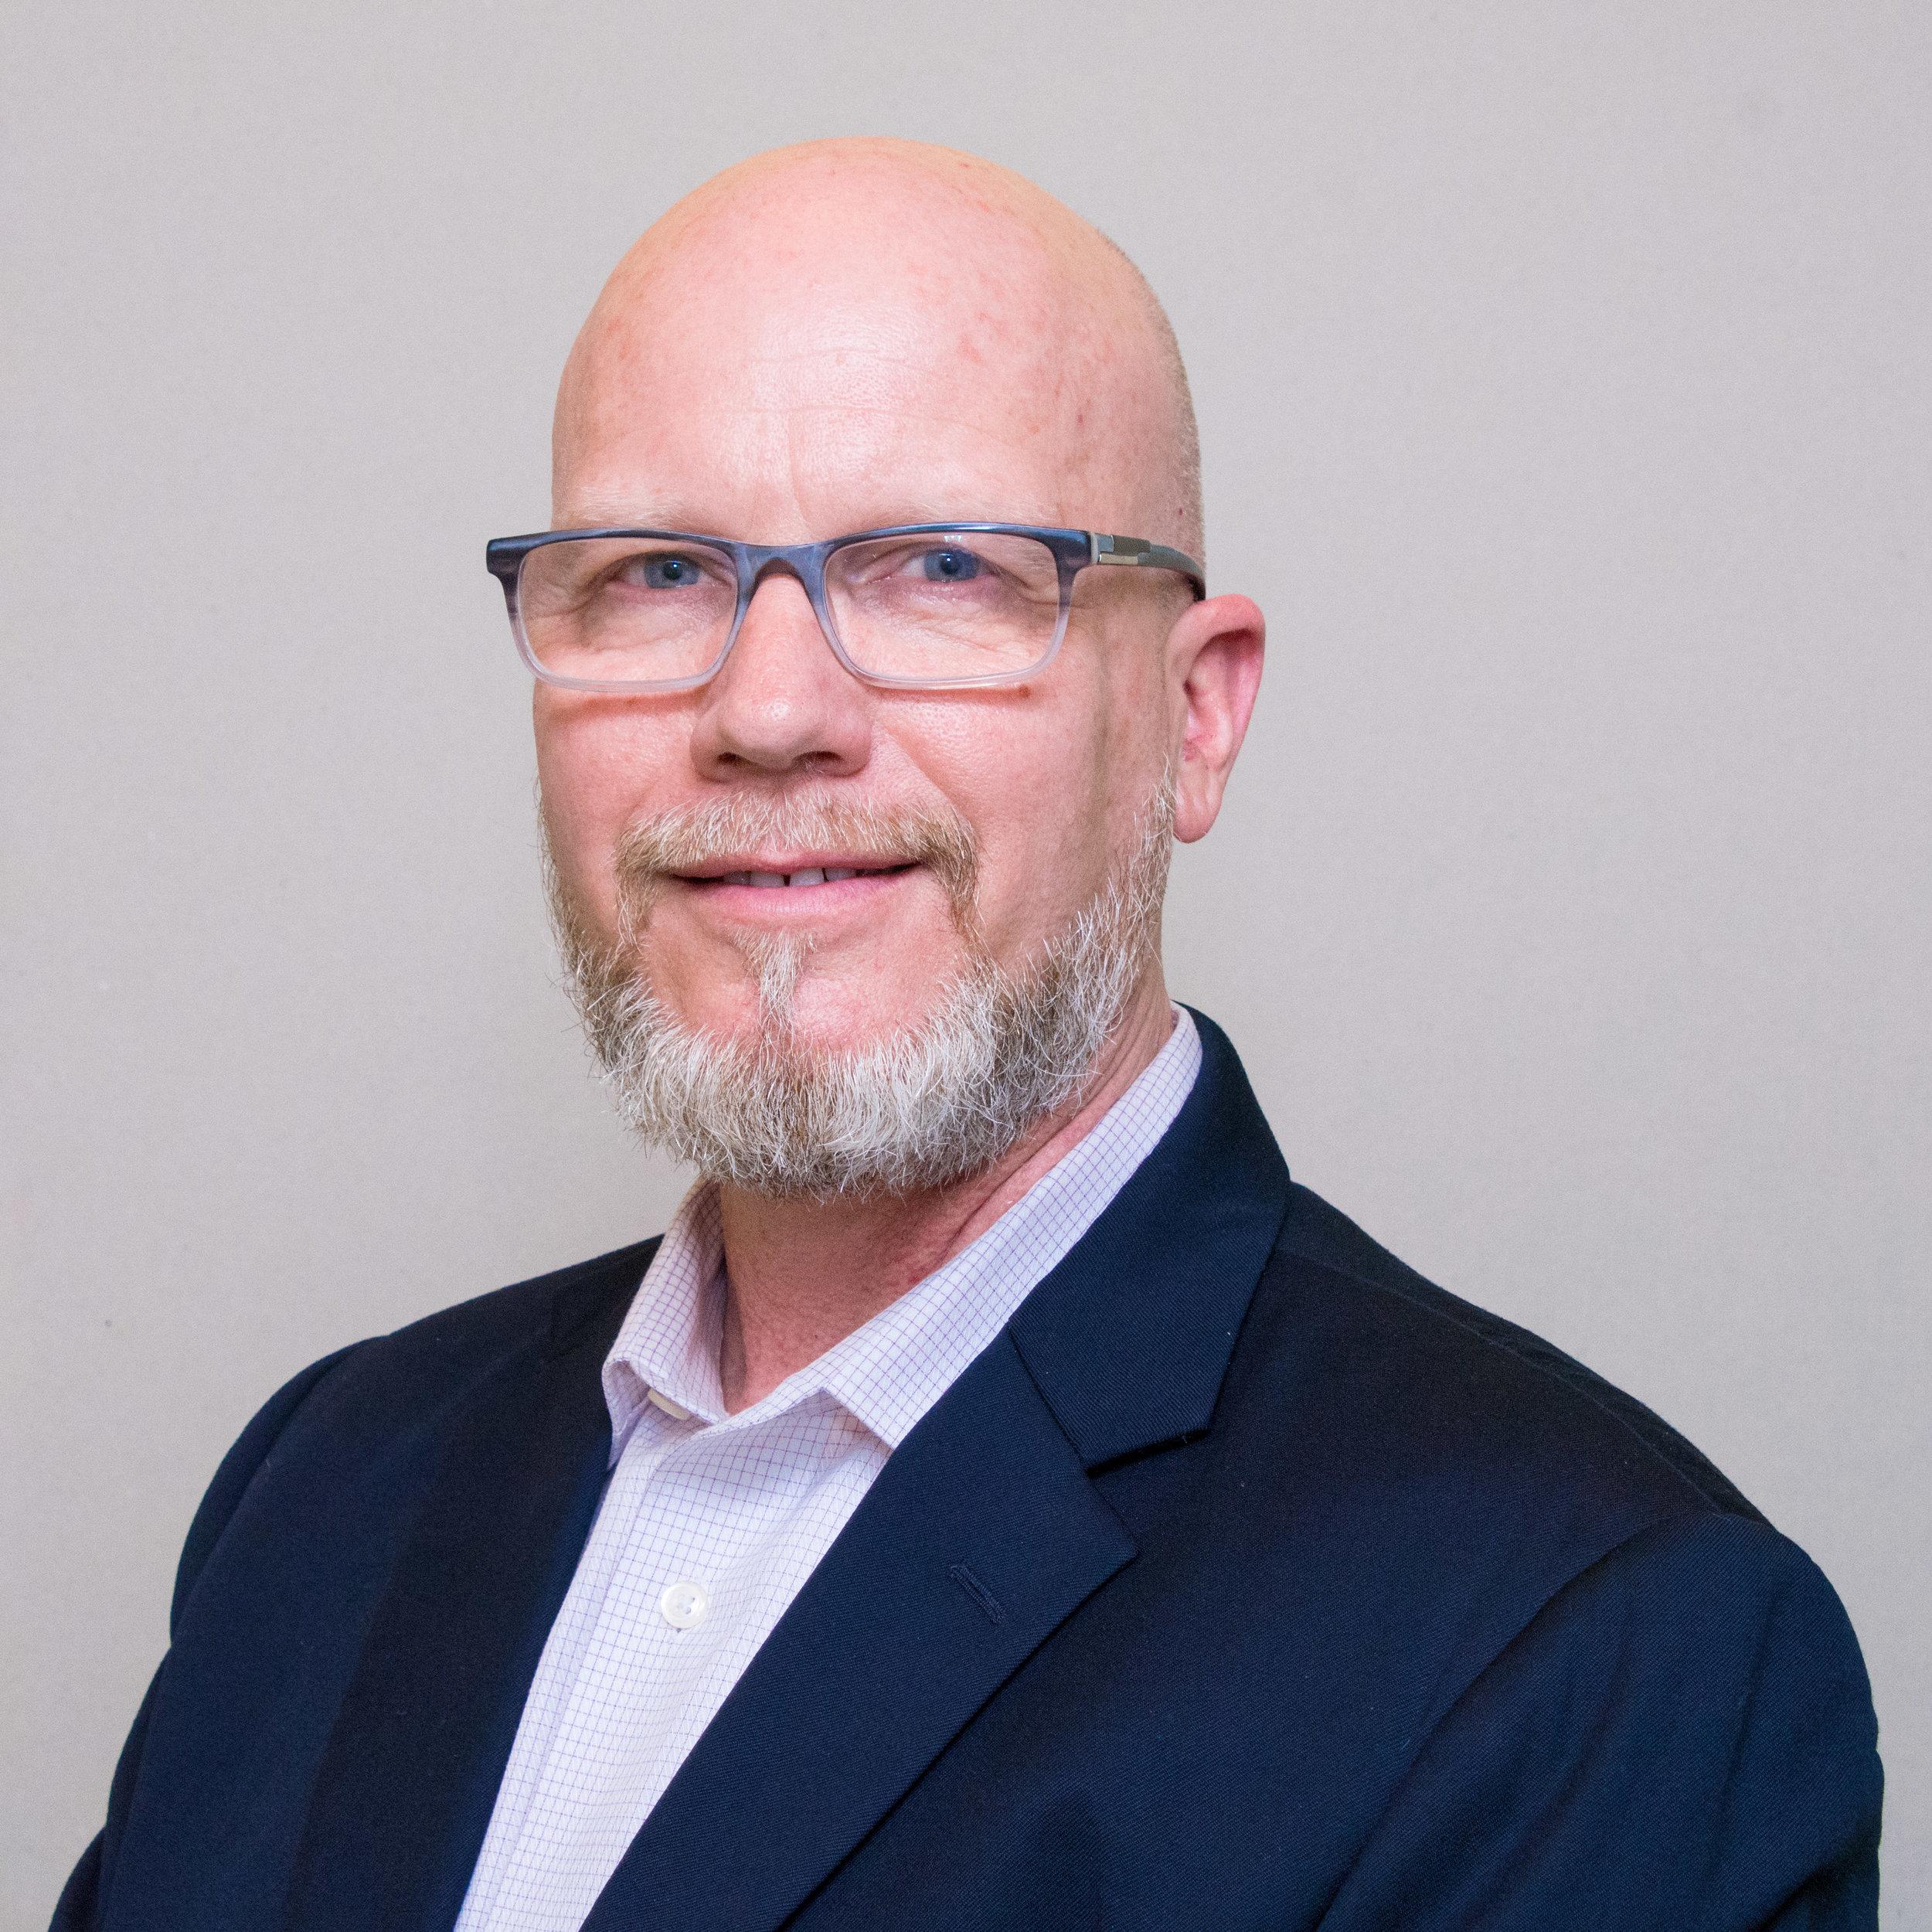 Dave DeJohn, Director, Cypress Fairbanks ISD